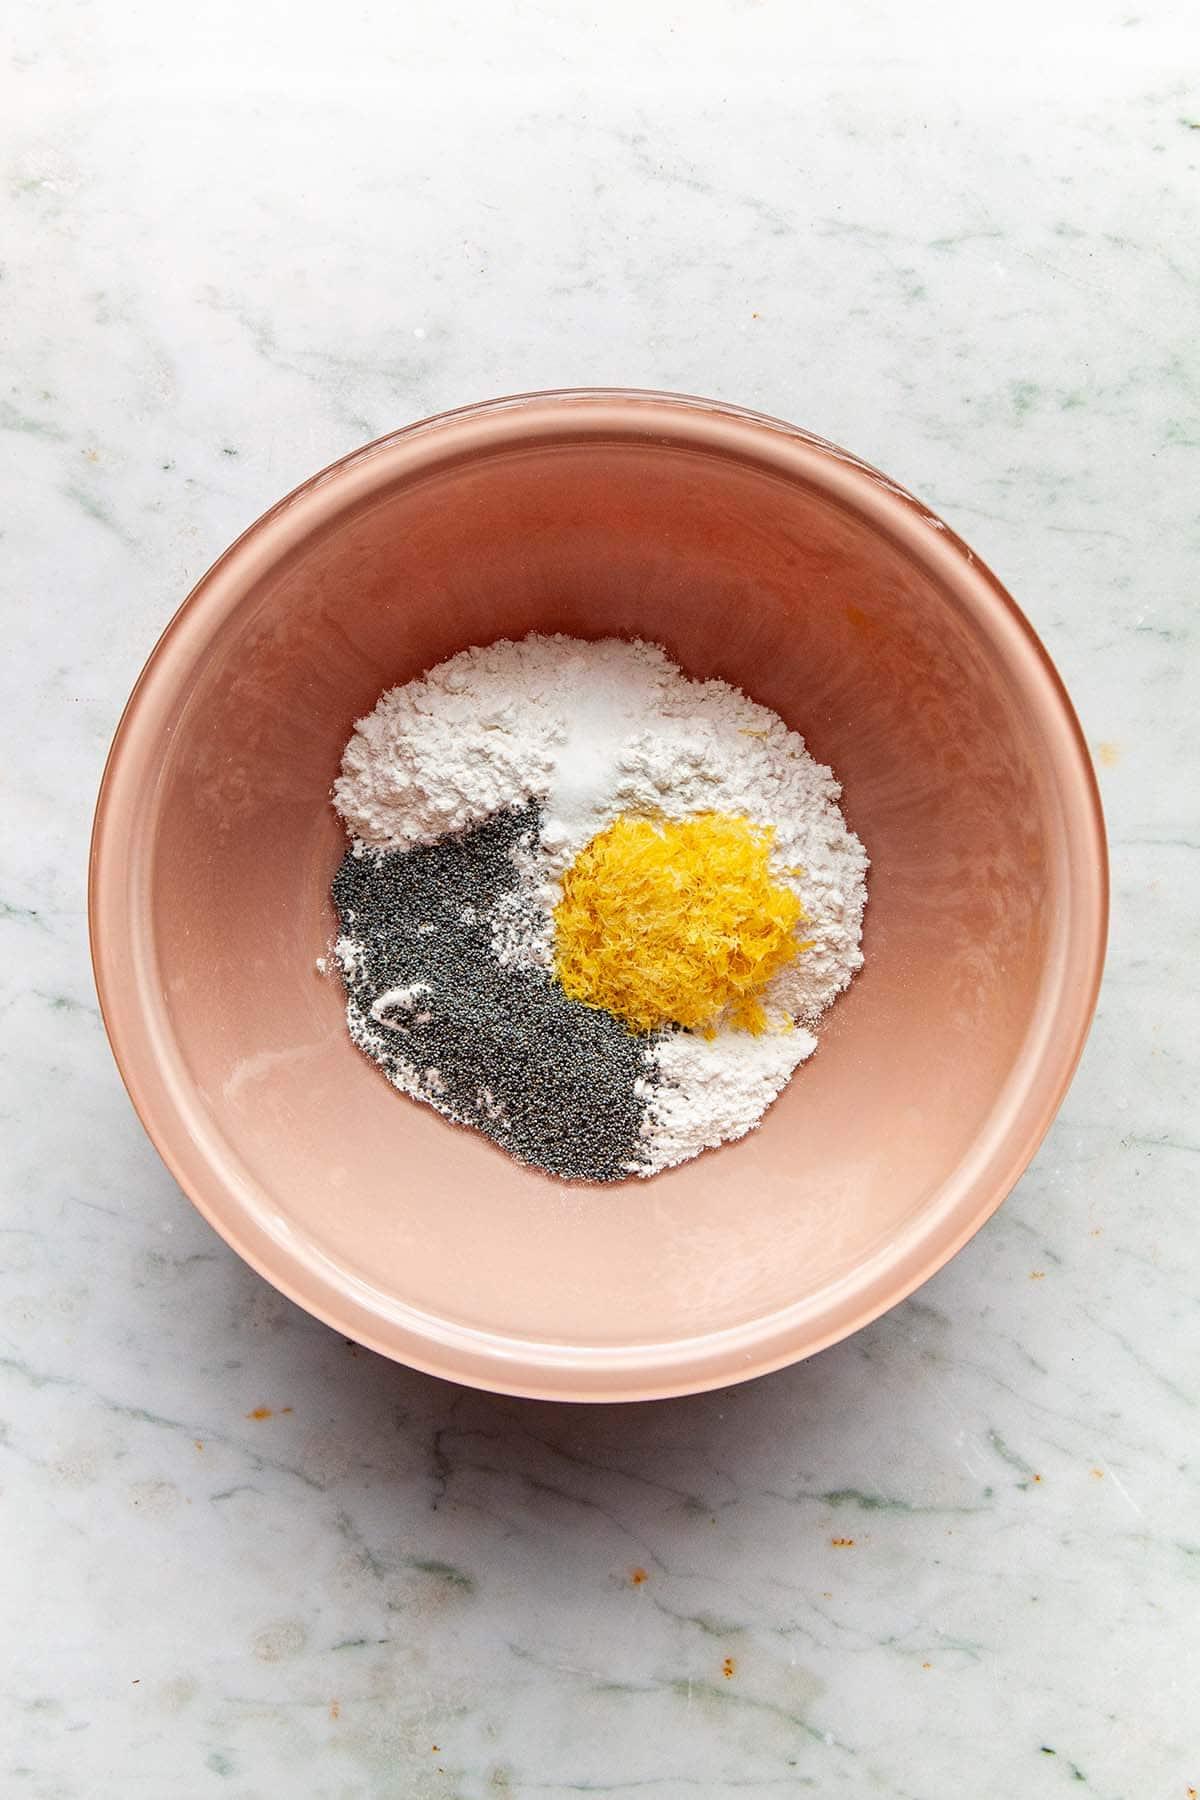 Flour, salt, poppy seeds, and lemon zest in a pink Pyrex bowl.